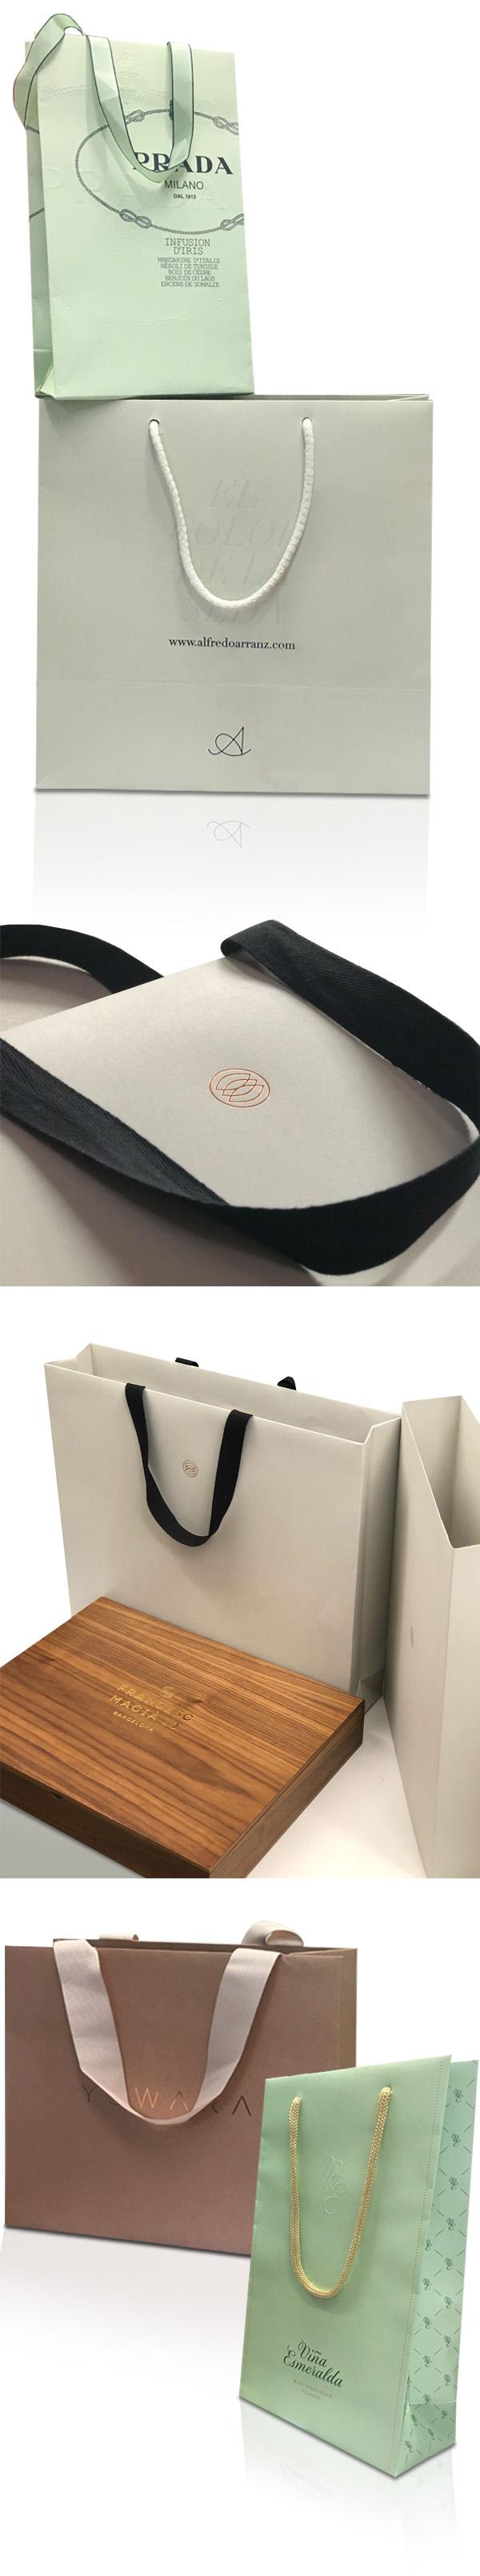 92bc4b141 Bolsas de papel de lujo personalizadas con asas de cordón